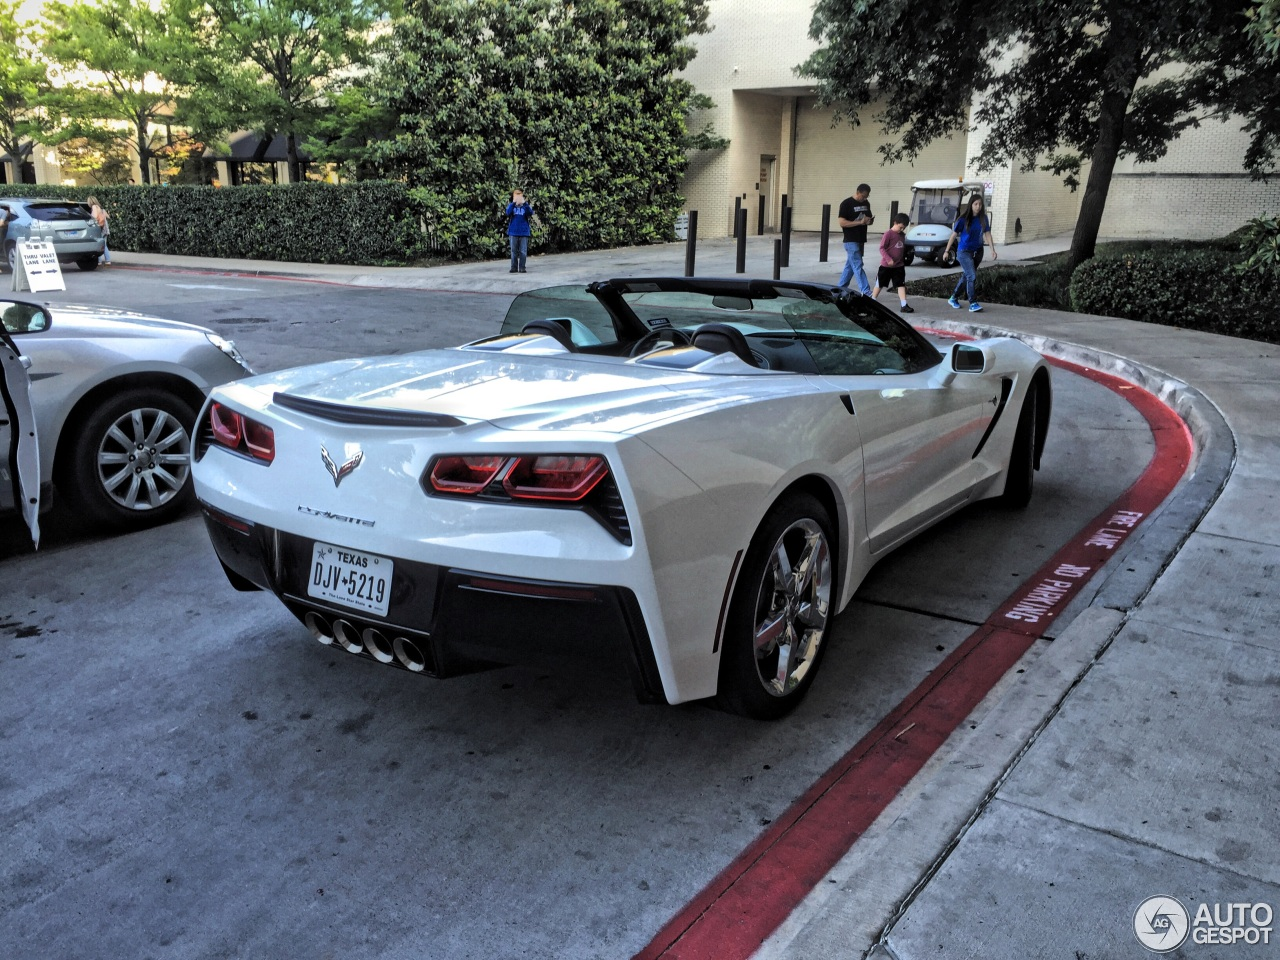 Chevrolet Corvette C7 Stingray Convertible 6 May 2015